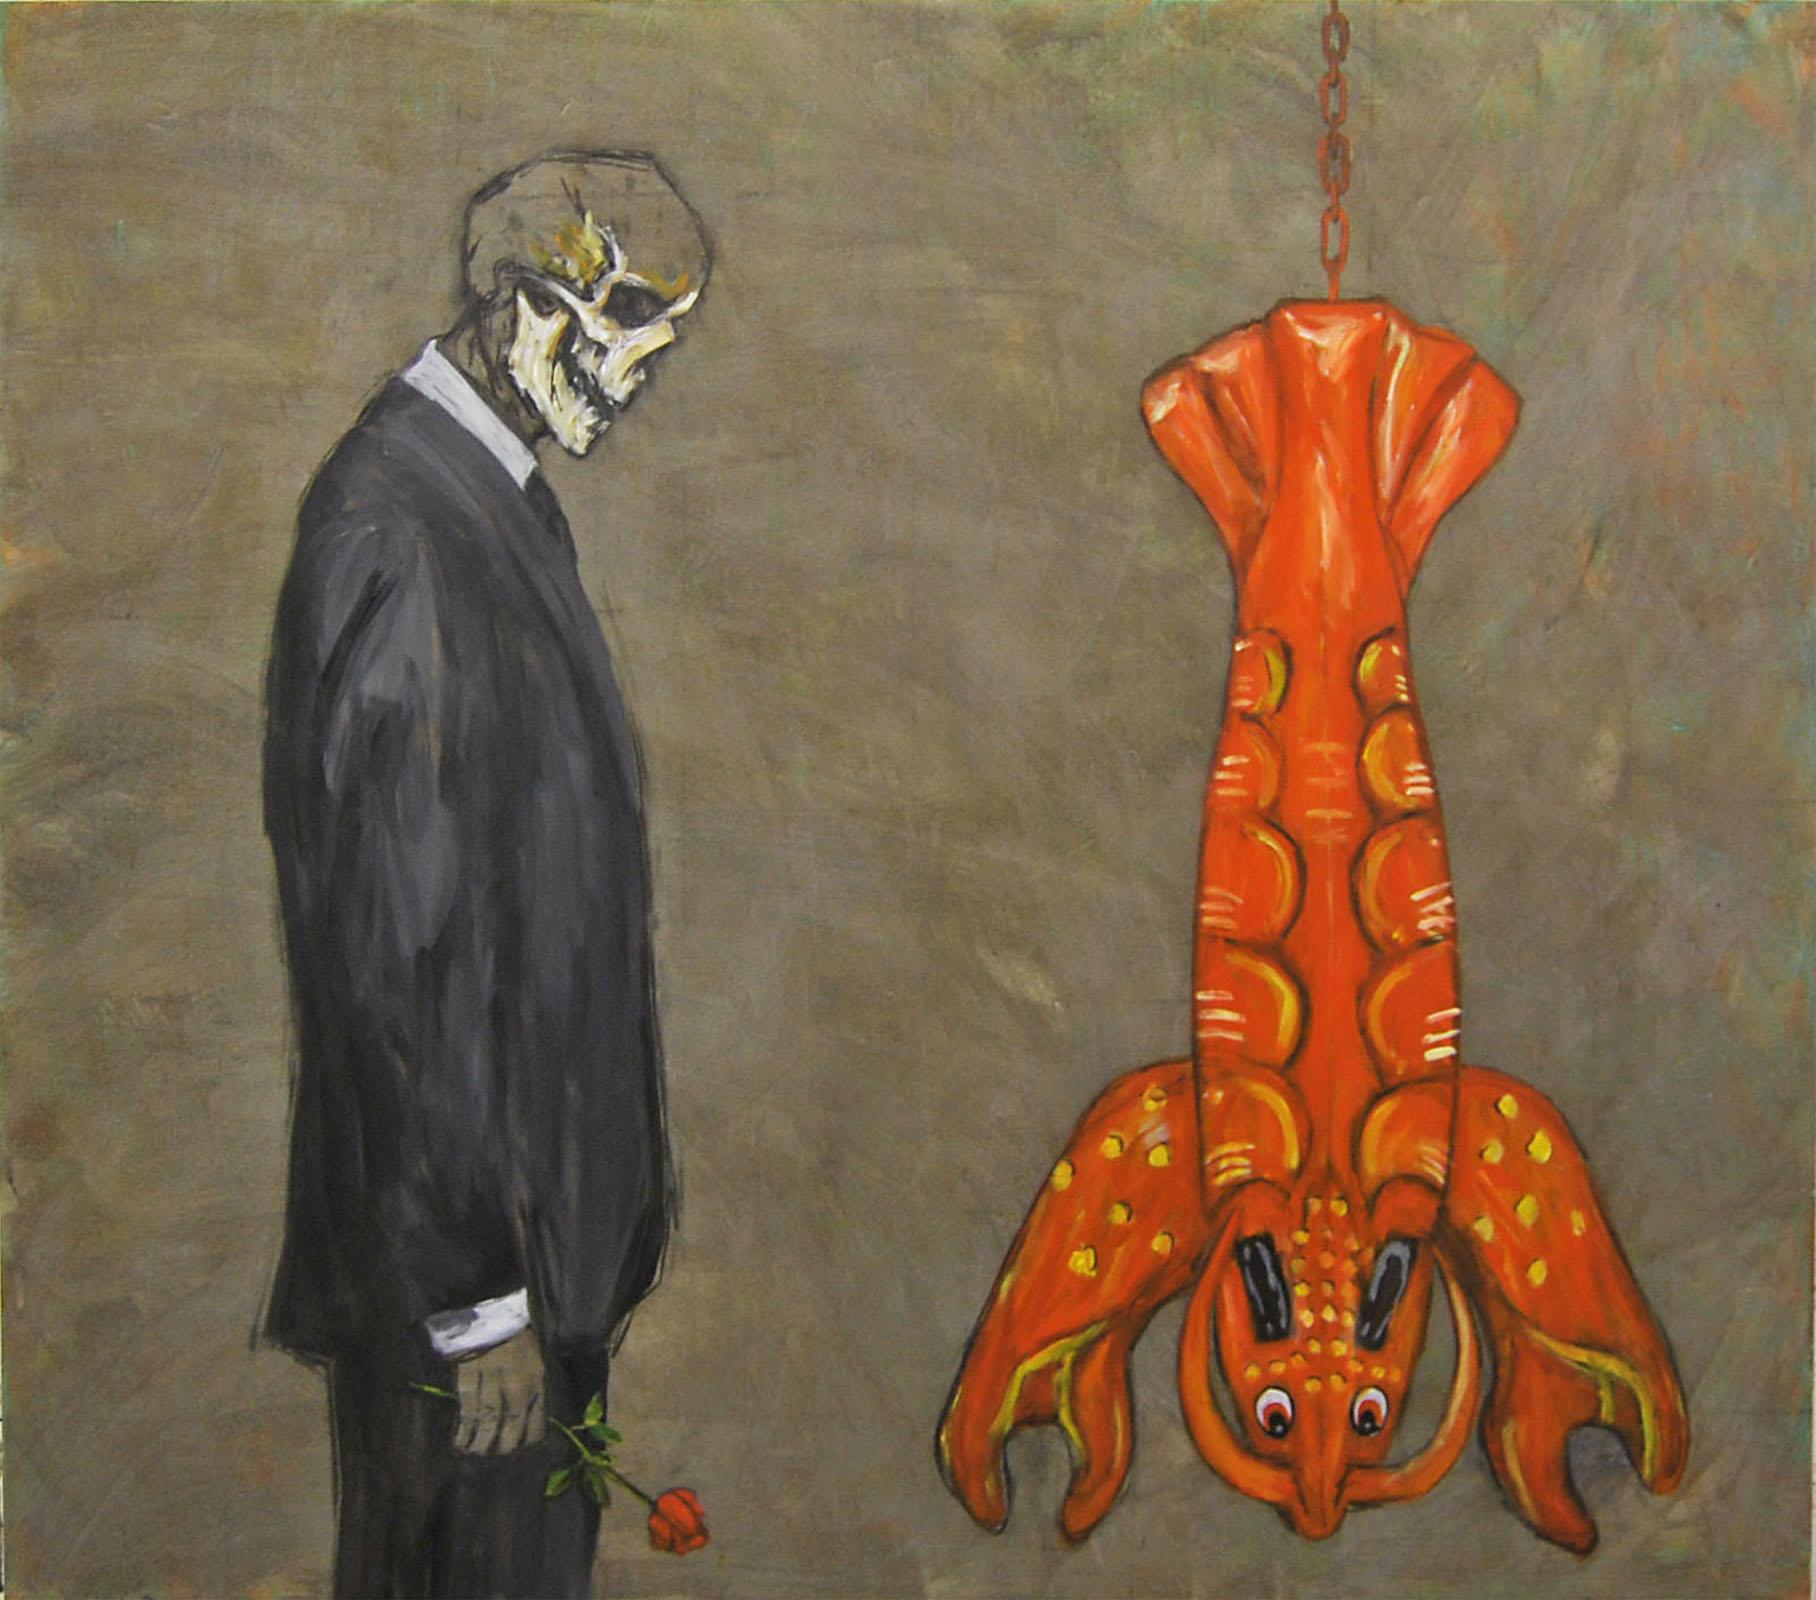 Benjamin Girard -La mort du homard